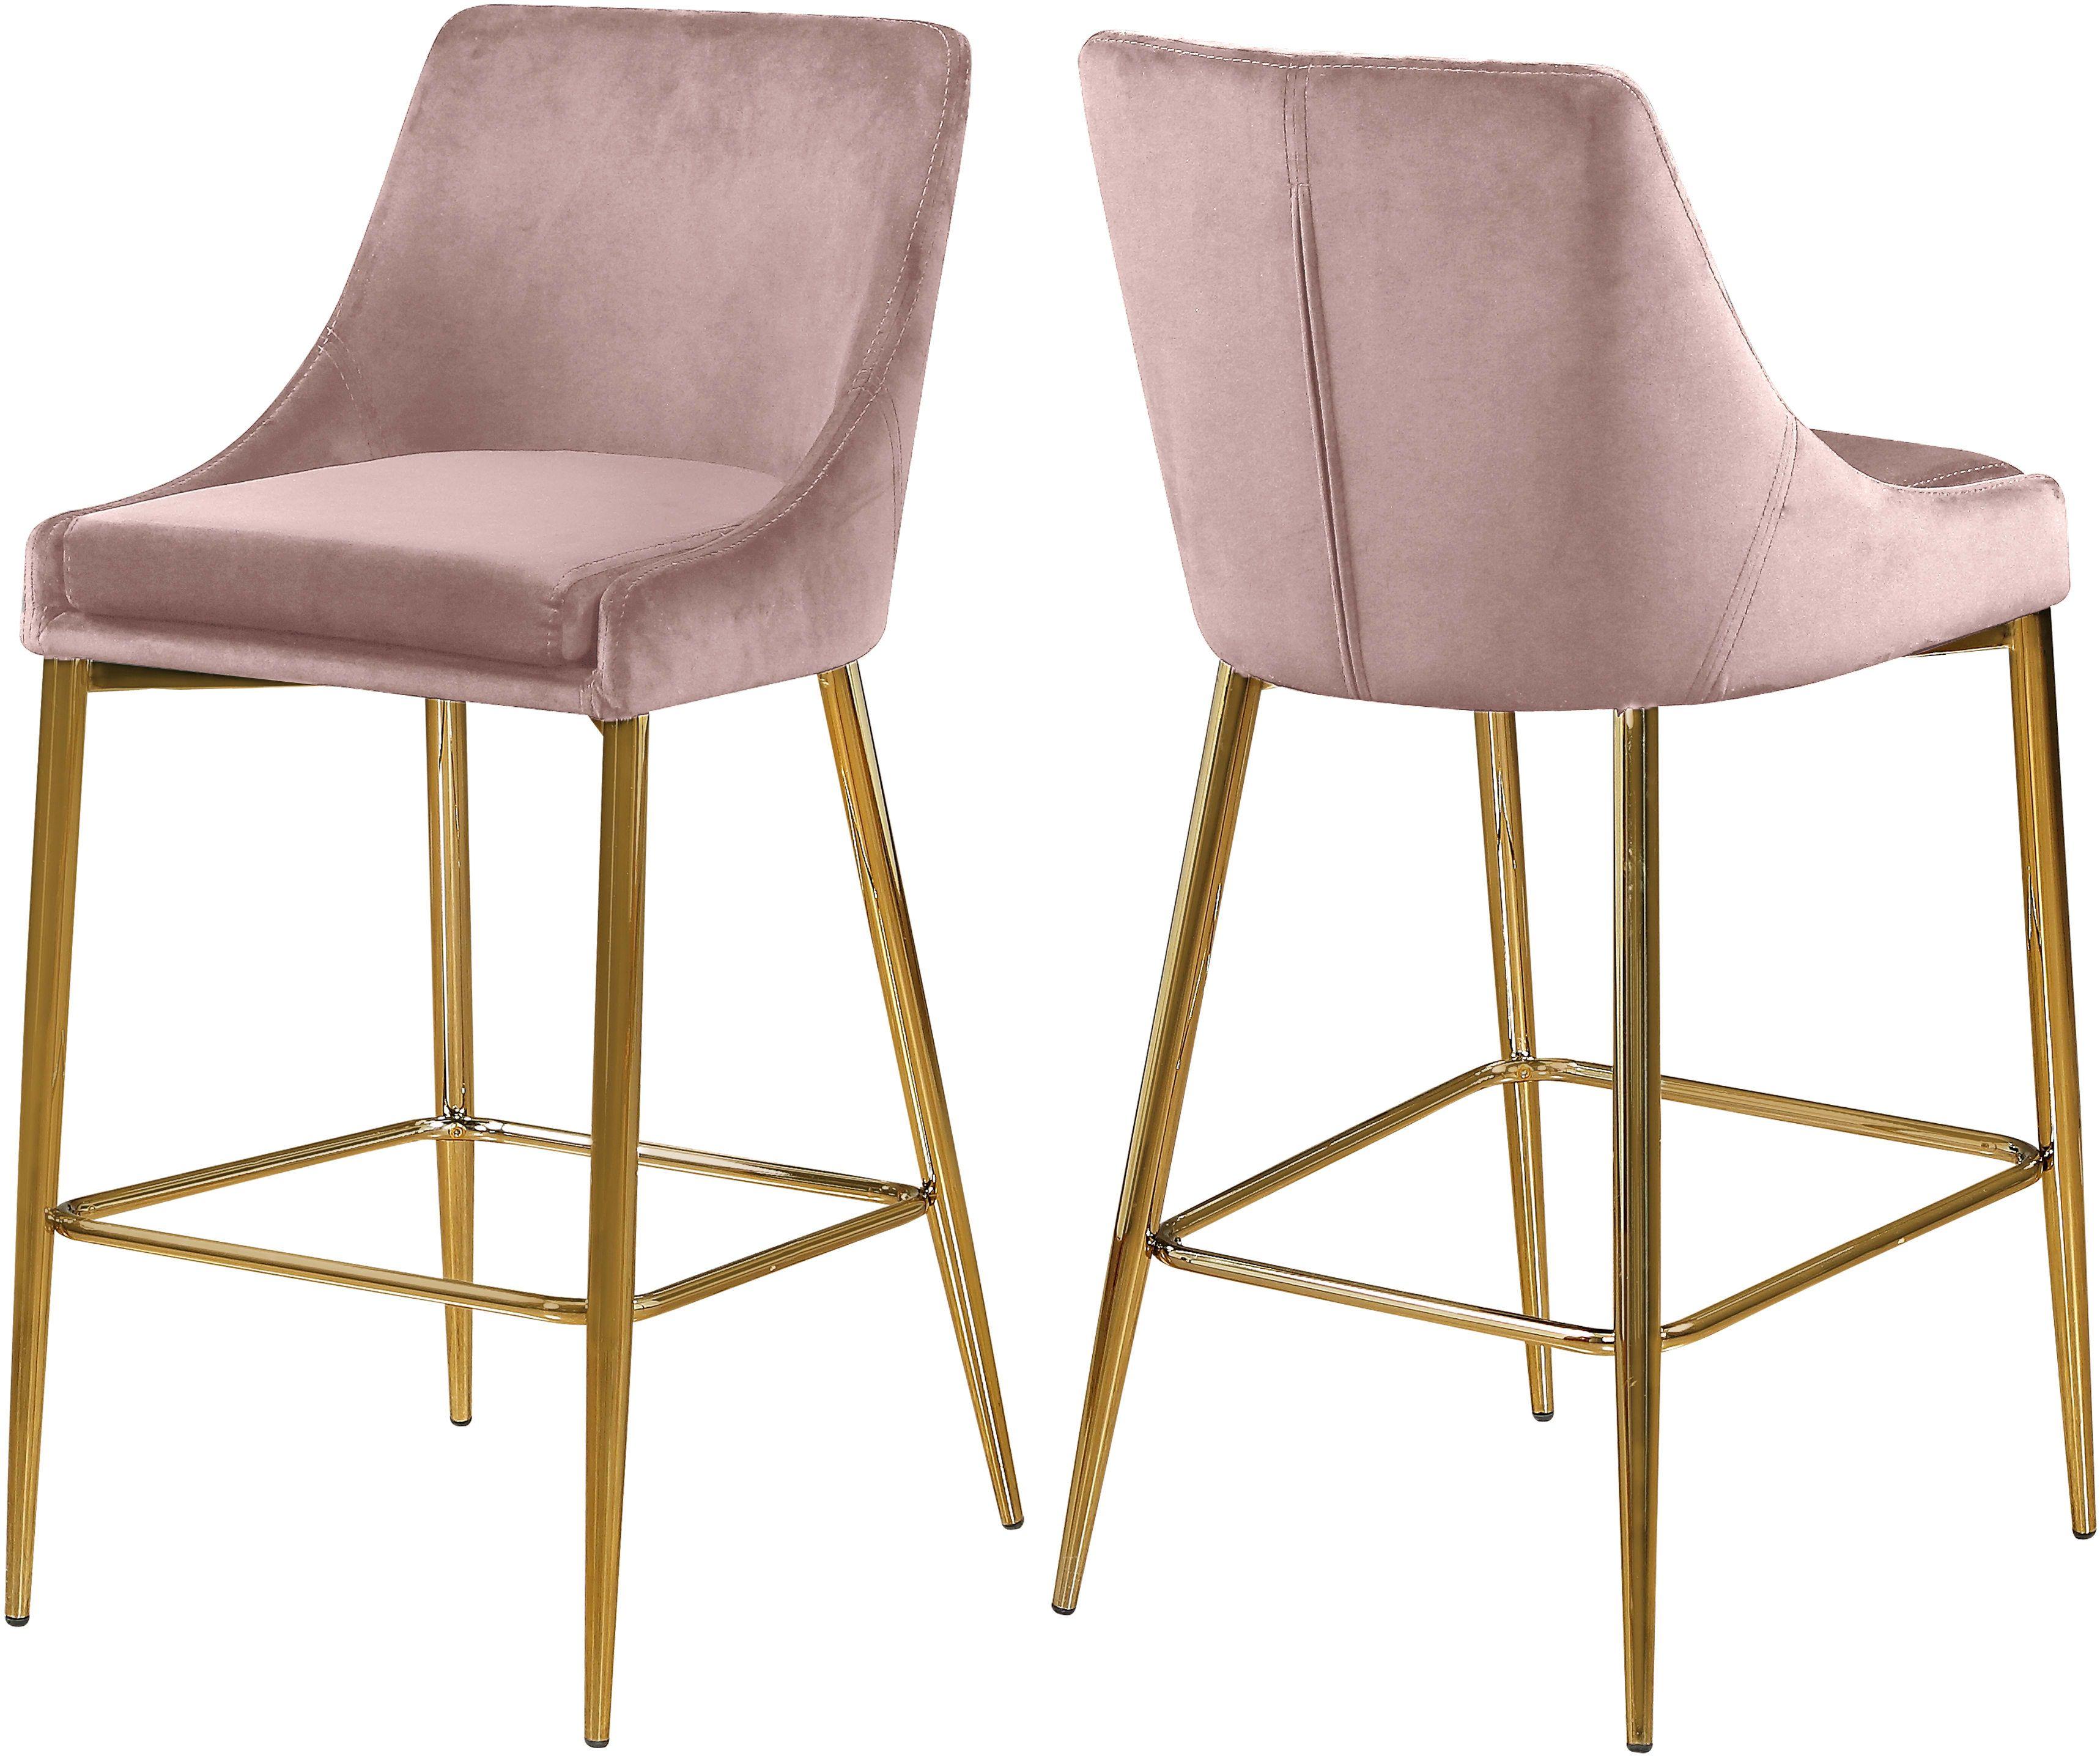 Stupendous Meridian Karina Pink Velvet Stool With Gold Metal Base Set Cjindustries Chair Design For Home Cjindustriesco